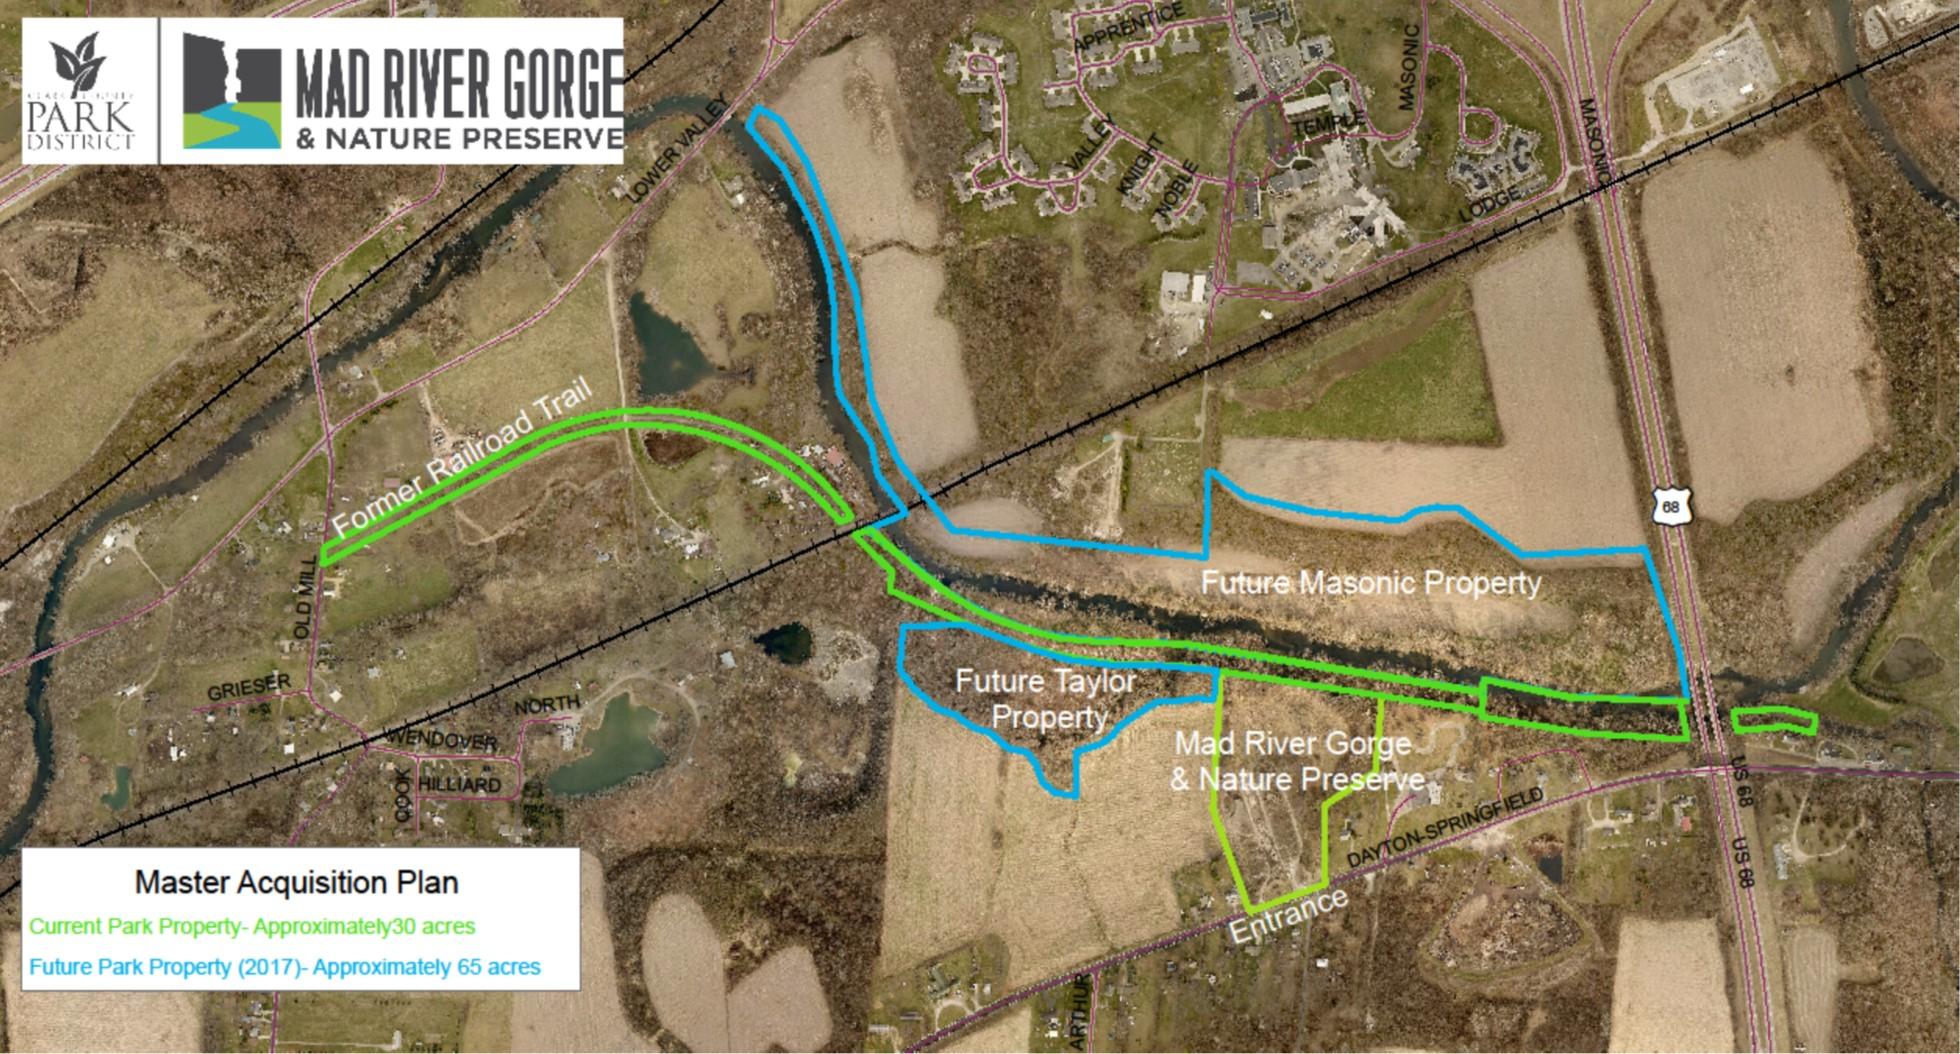 Mad River Gorge & Nature Preserve